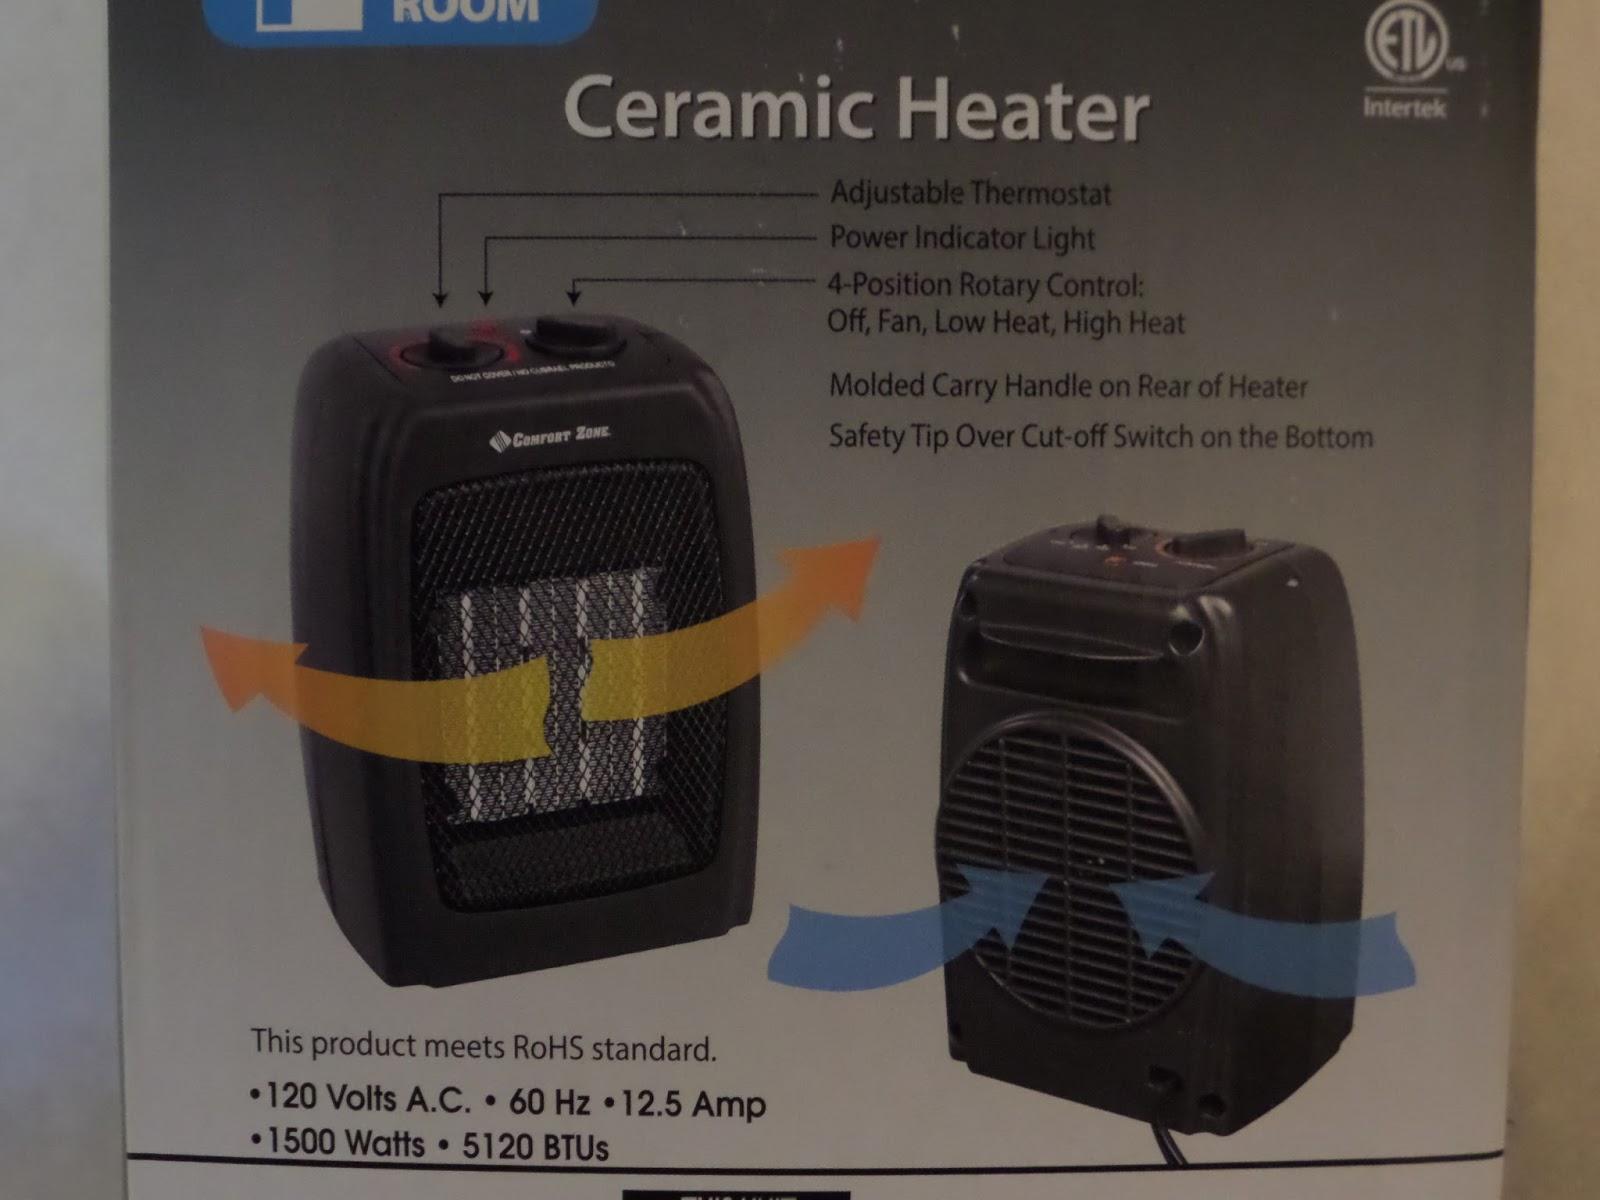 group dyna comforter rmc indoor comfort glo heater btu radiant heaters inc catalog zone kerosene ghp product